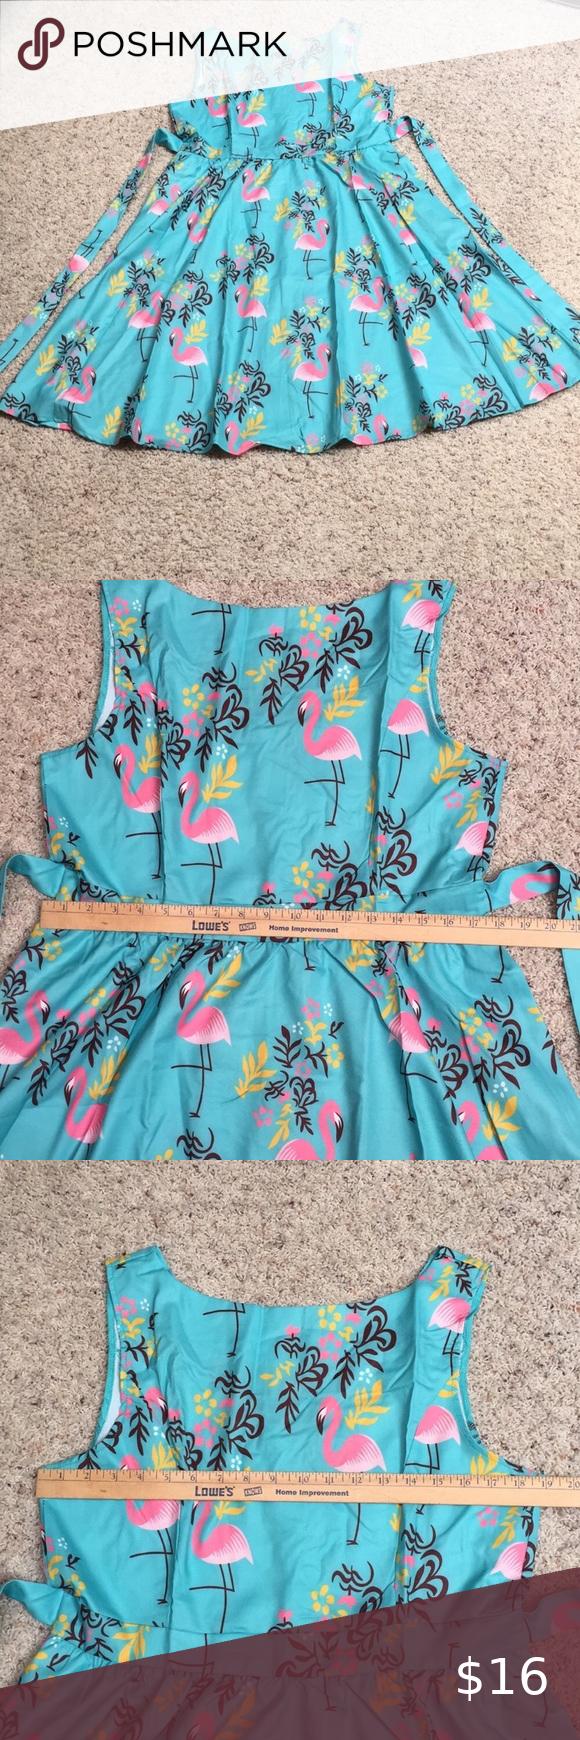 Beautiful Vintage Swing Tropical Dress 2x Beautiful Summer Dresses Dresses 2x Tropical Dress [ 1740 x 580 Pixel ]